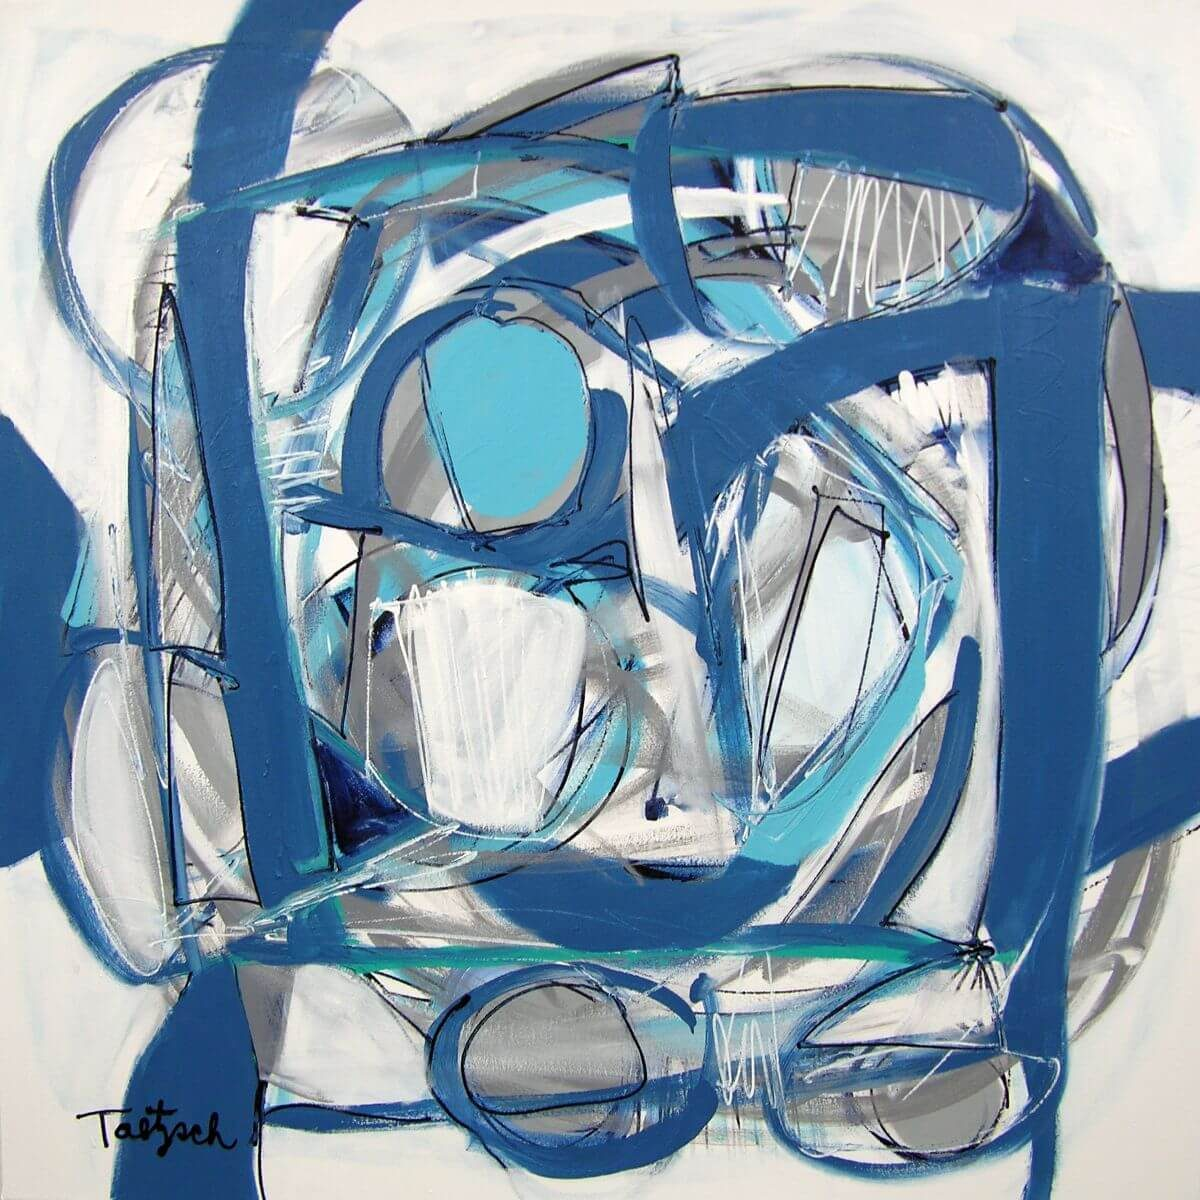 Blueberry Pond | Art bridal present | Mishkalo Wedding Registry